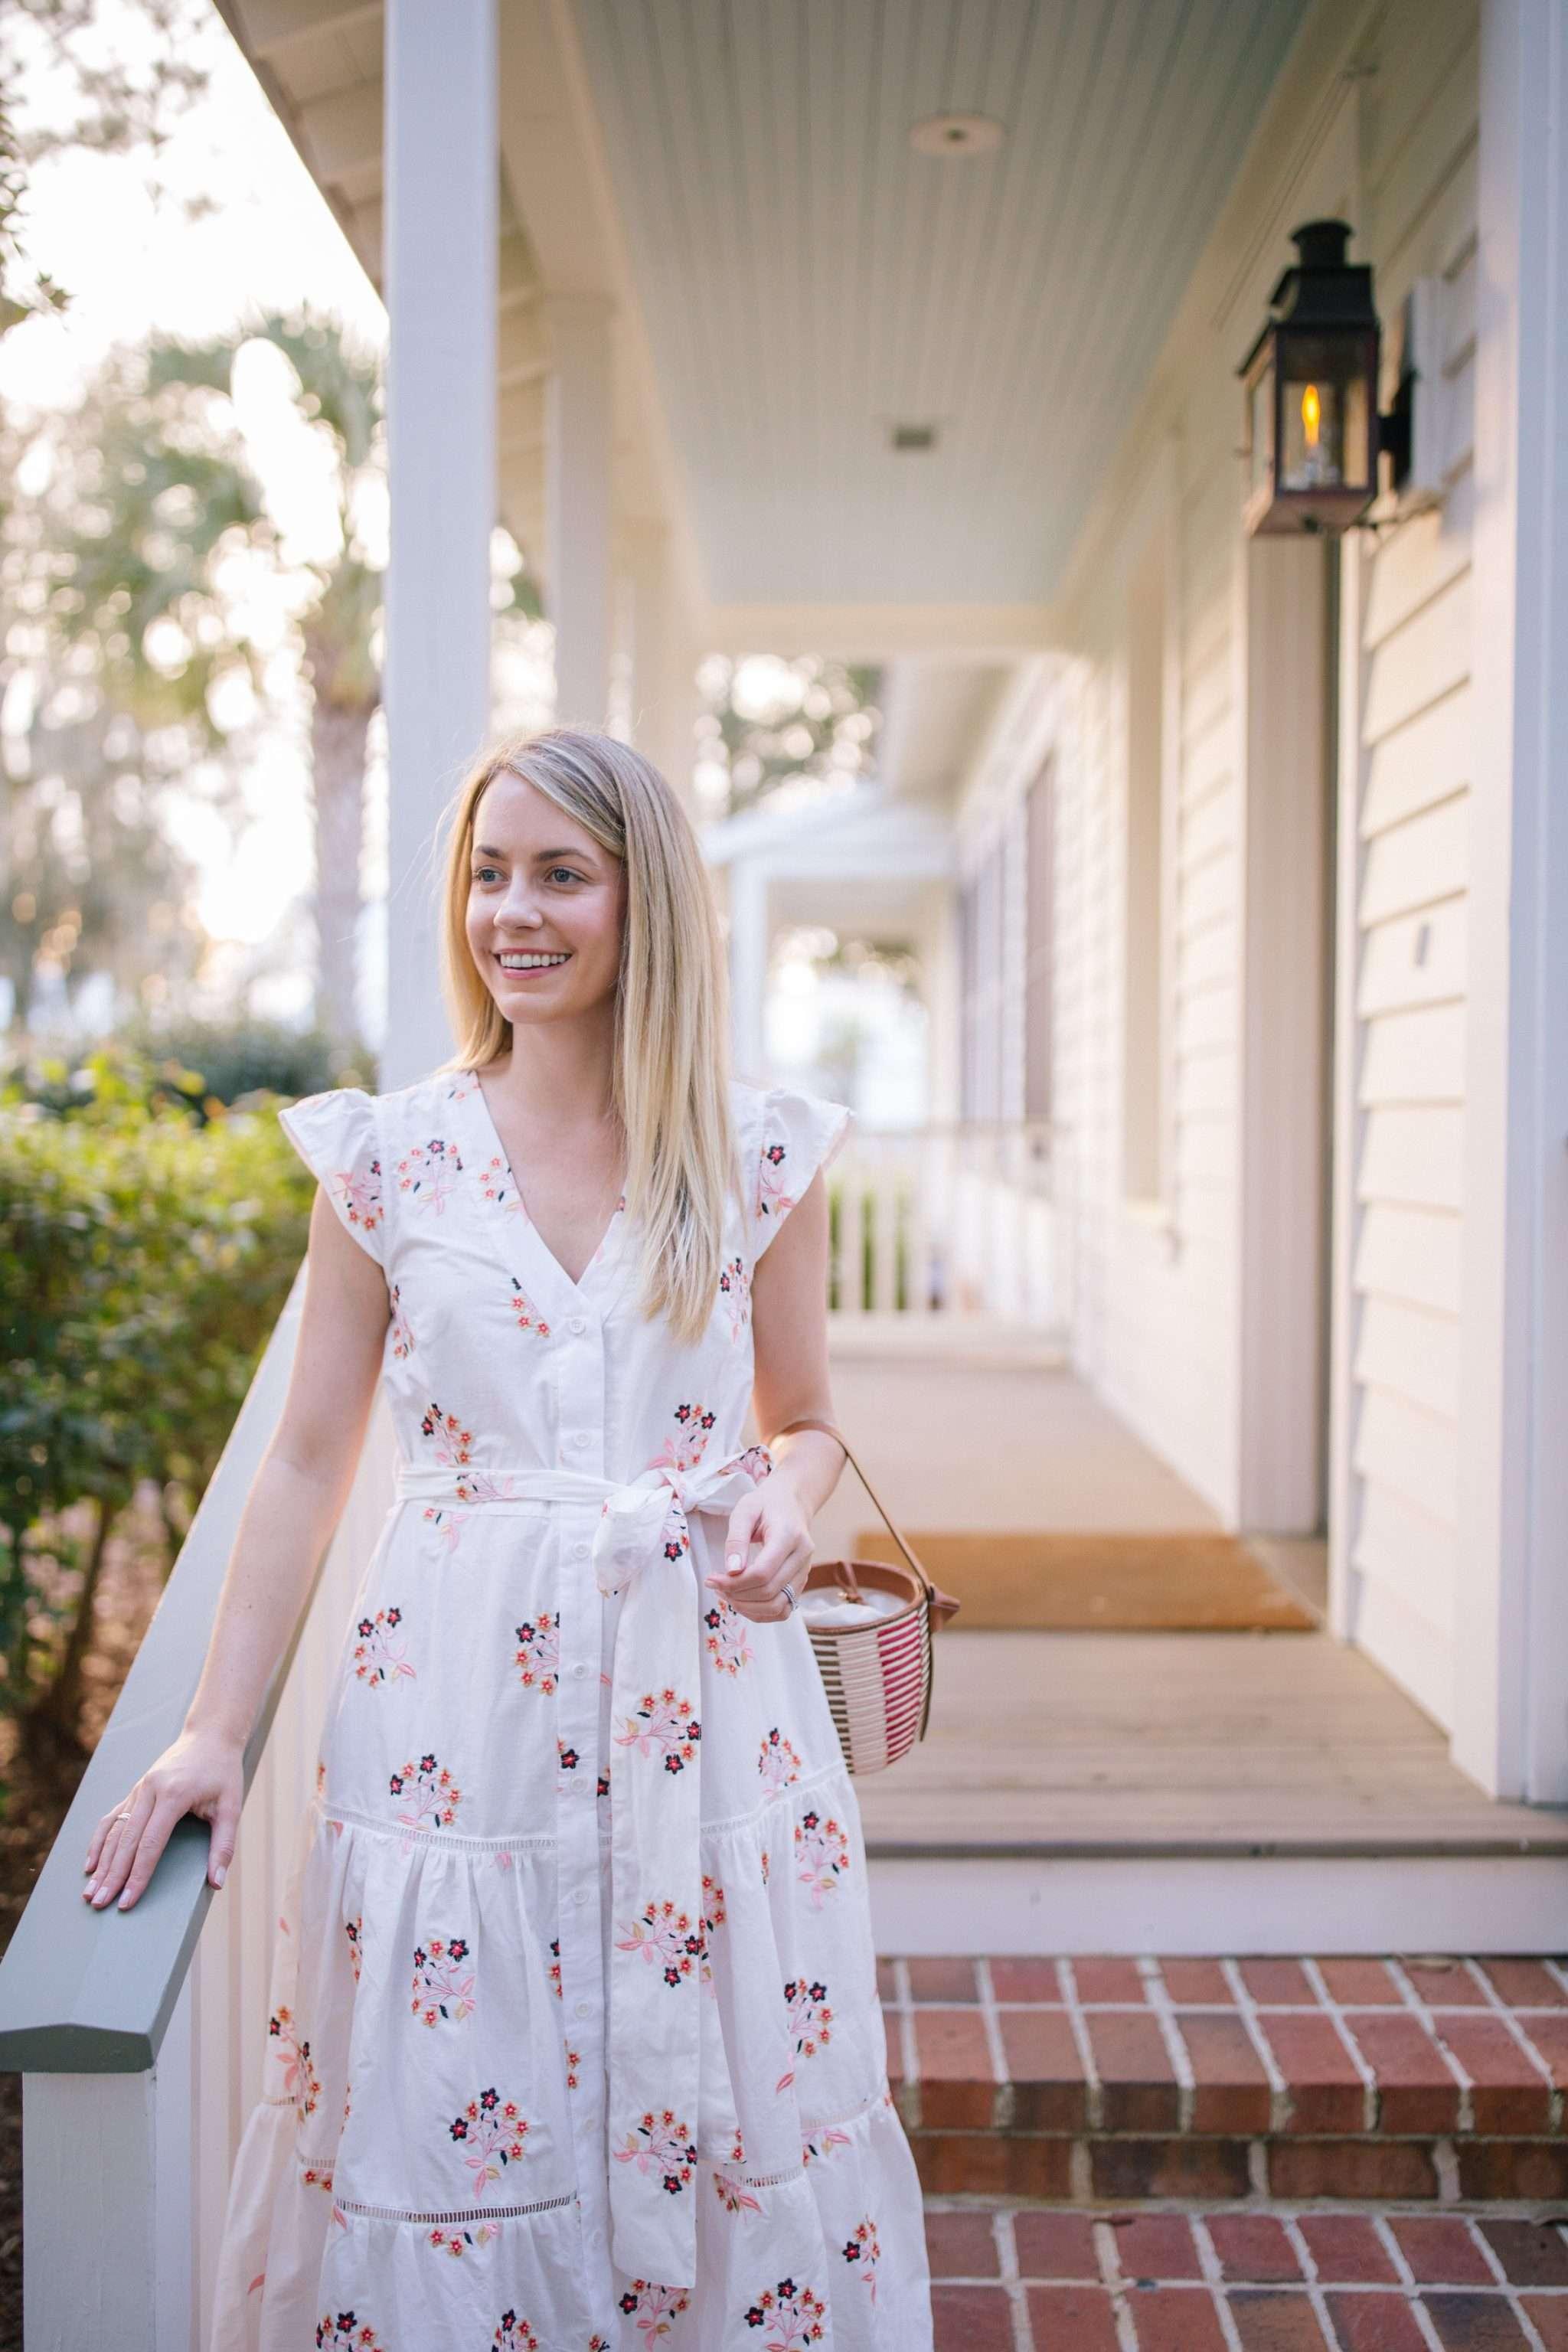 Jillian Attaway Eversole styles a Pearl by Lela Rose white floral dress | Rhyme & Reason